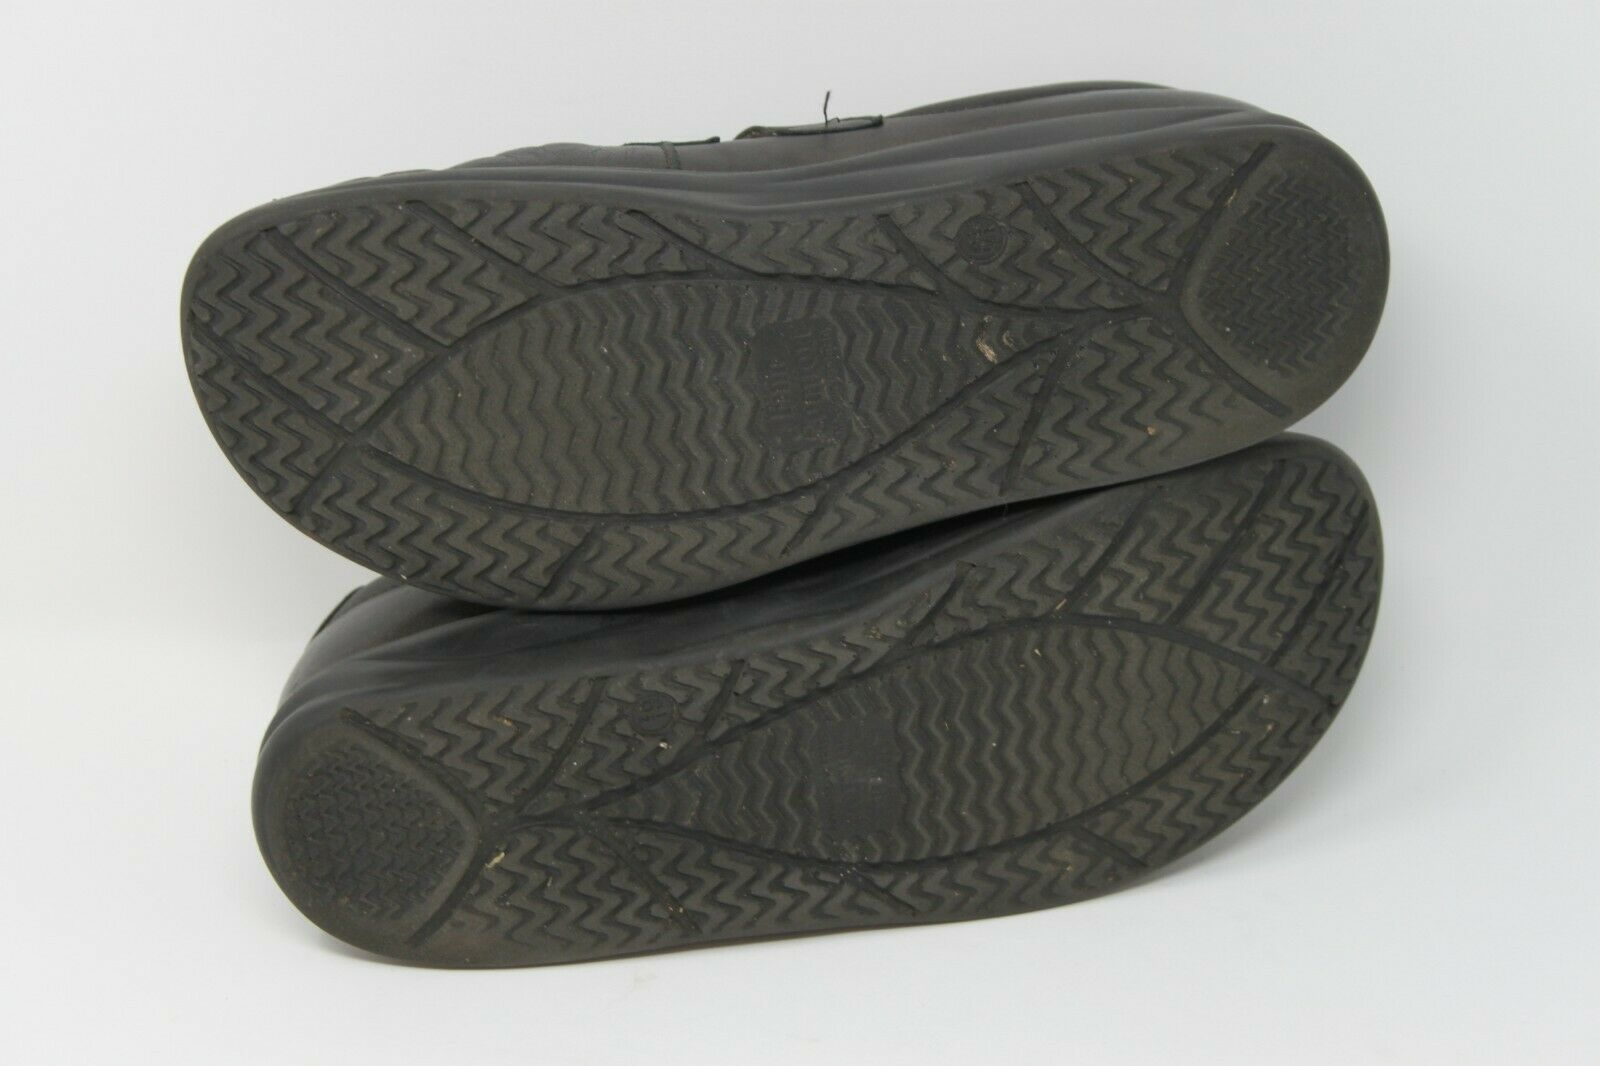 Finn Comfort Size 6.5 M Black Mary Jane Hook & Loop Comfort Orthopedic Shoes image 4